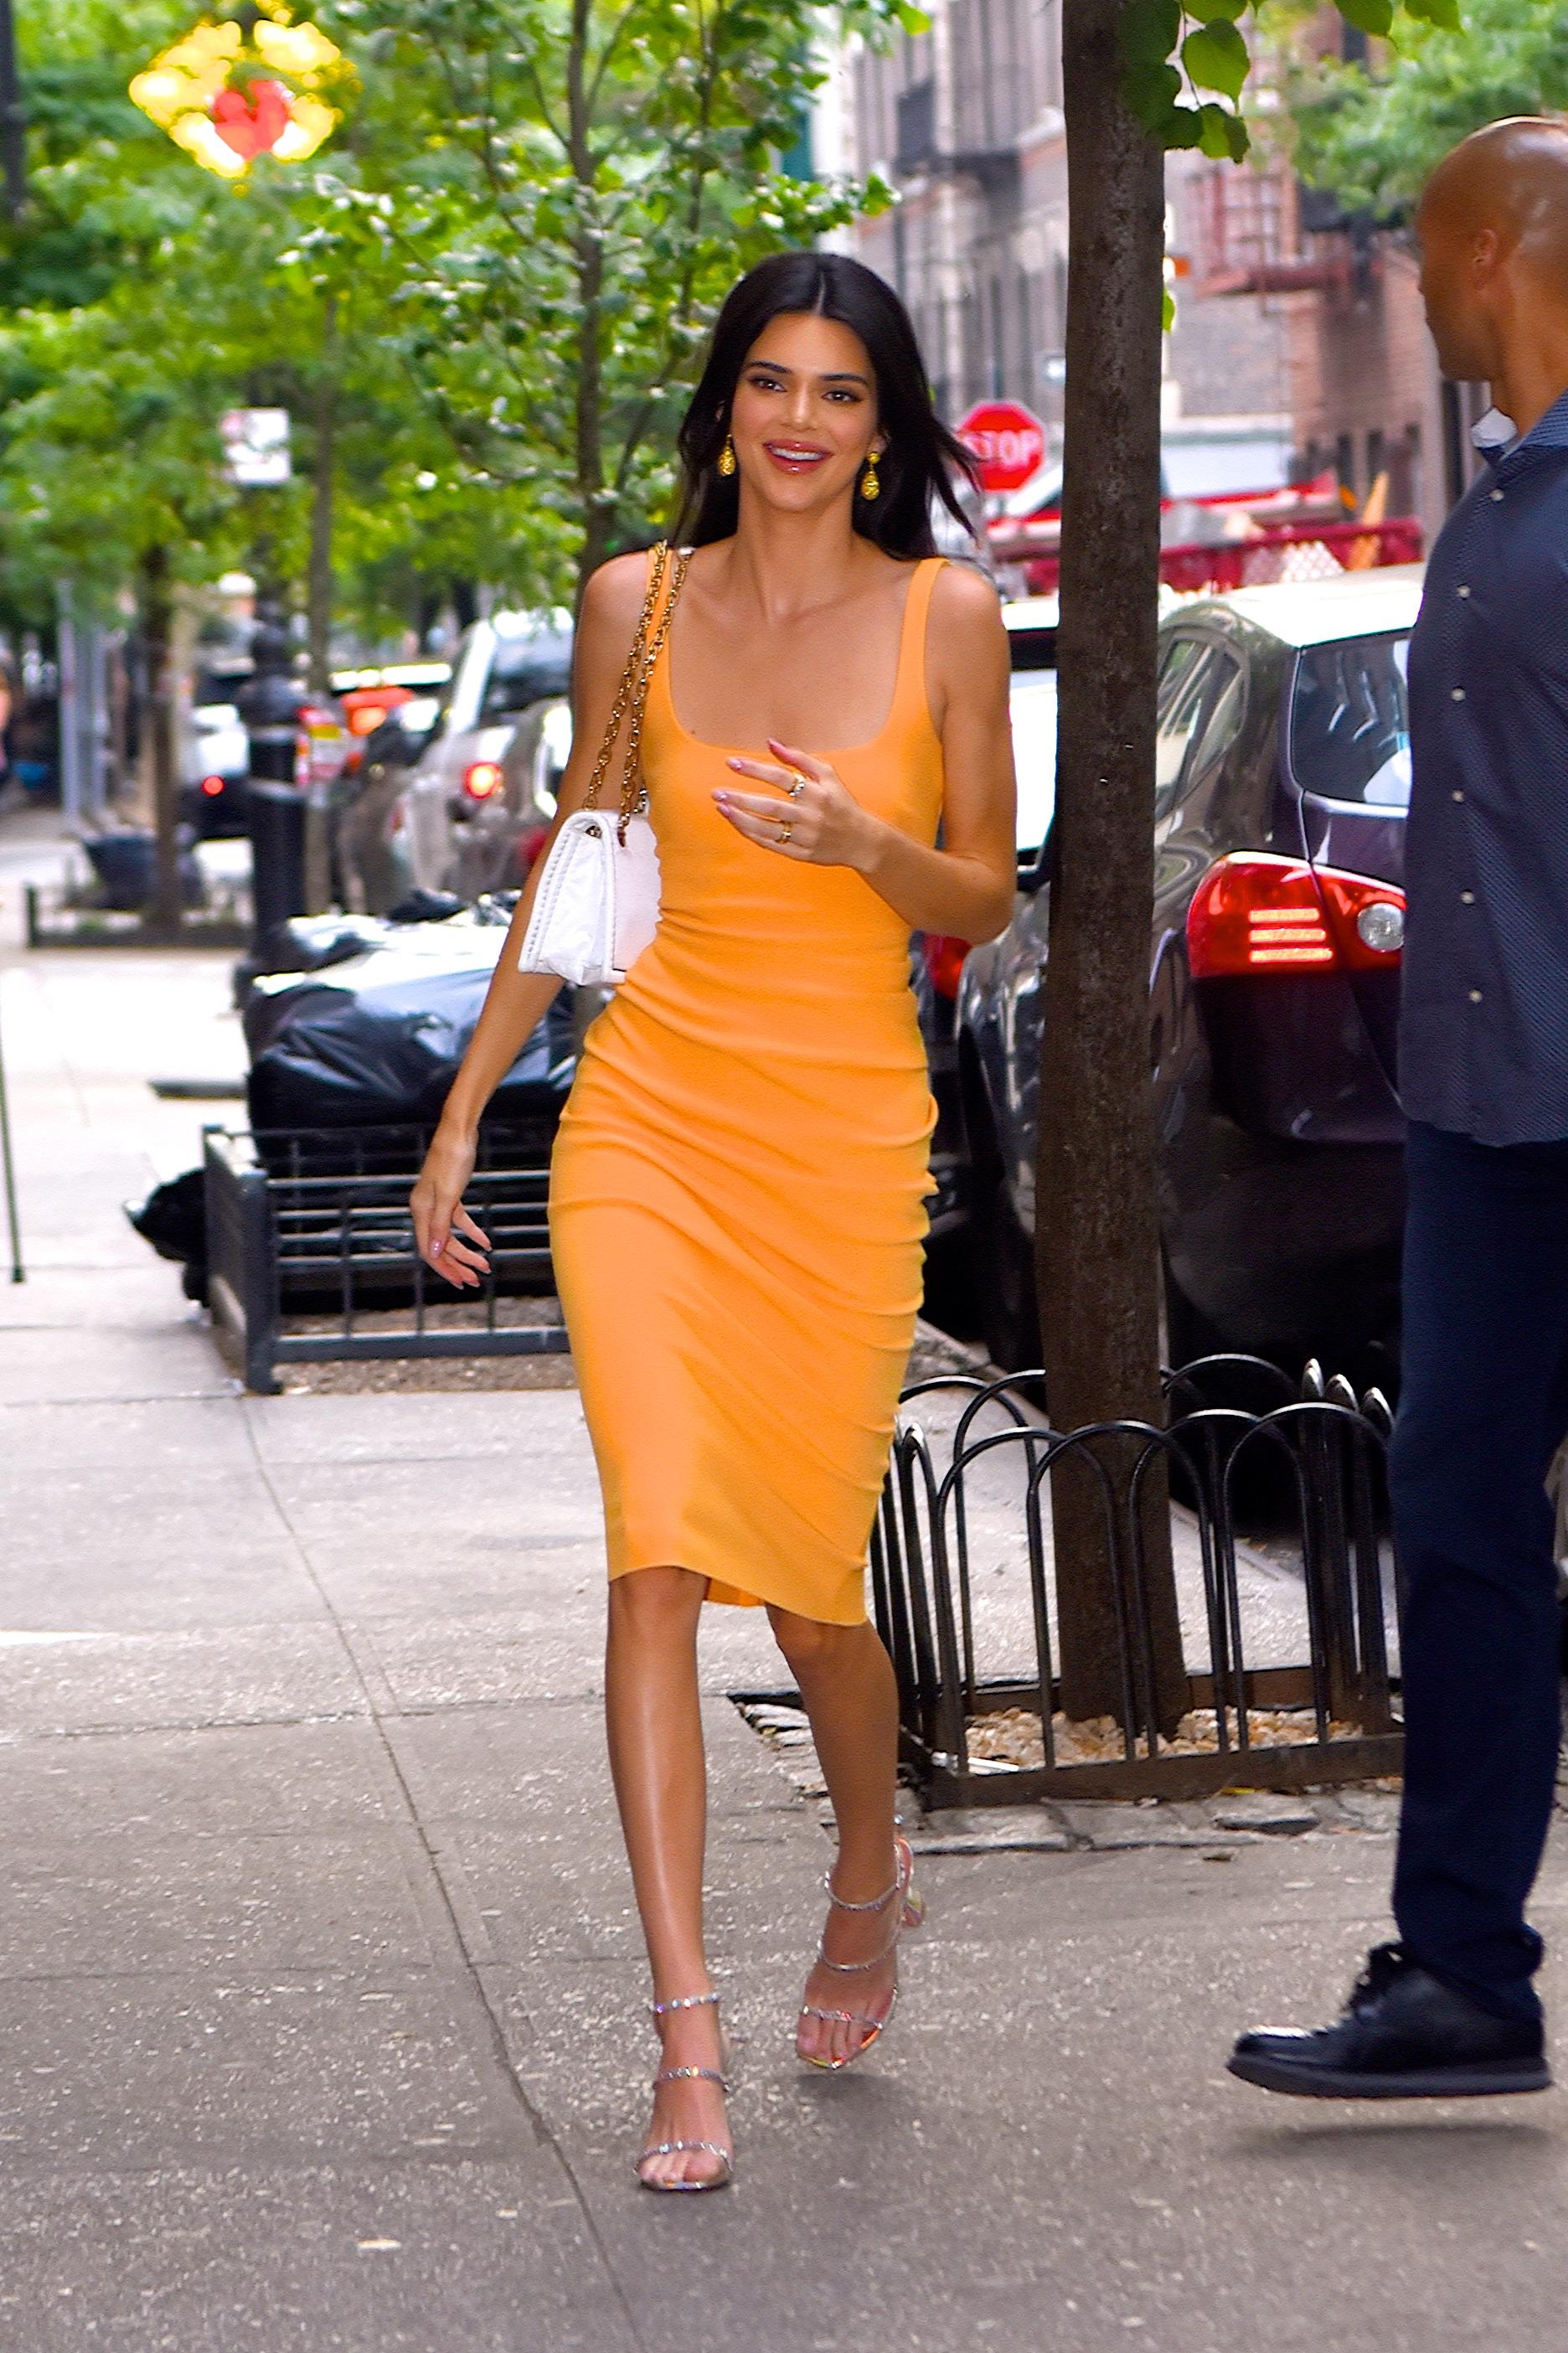 Kendall Jenner's Street Style Model Rocks Slinky, Tangerine Dress